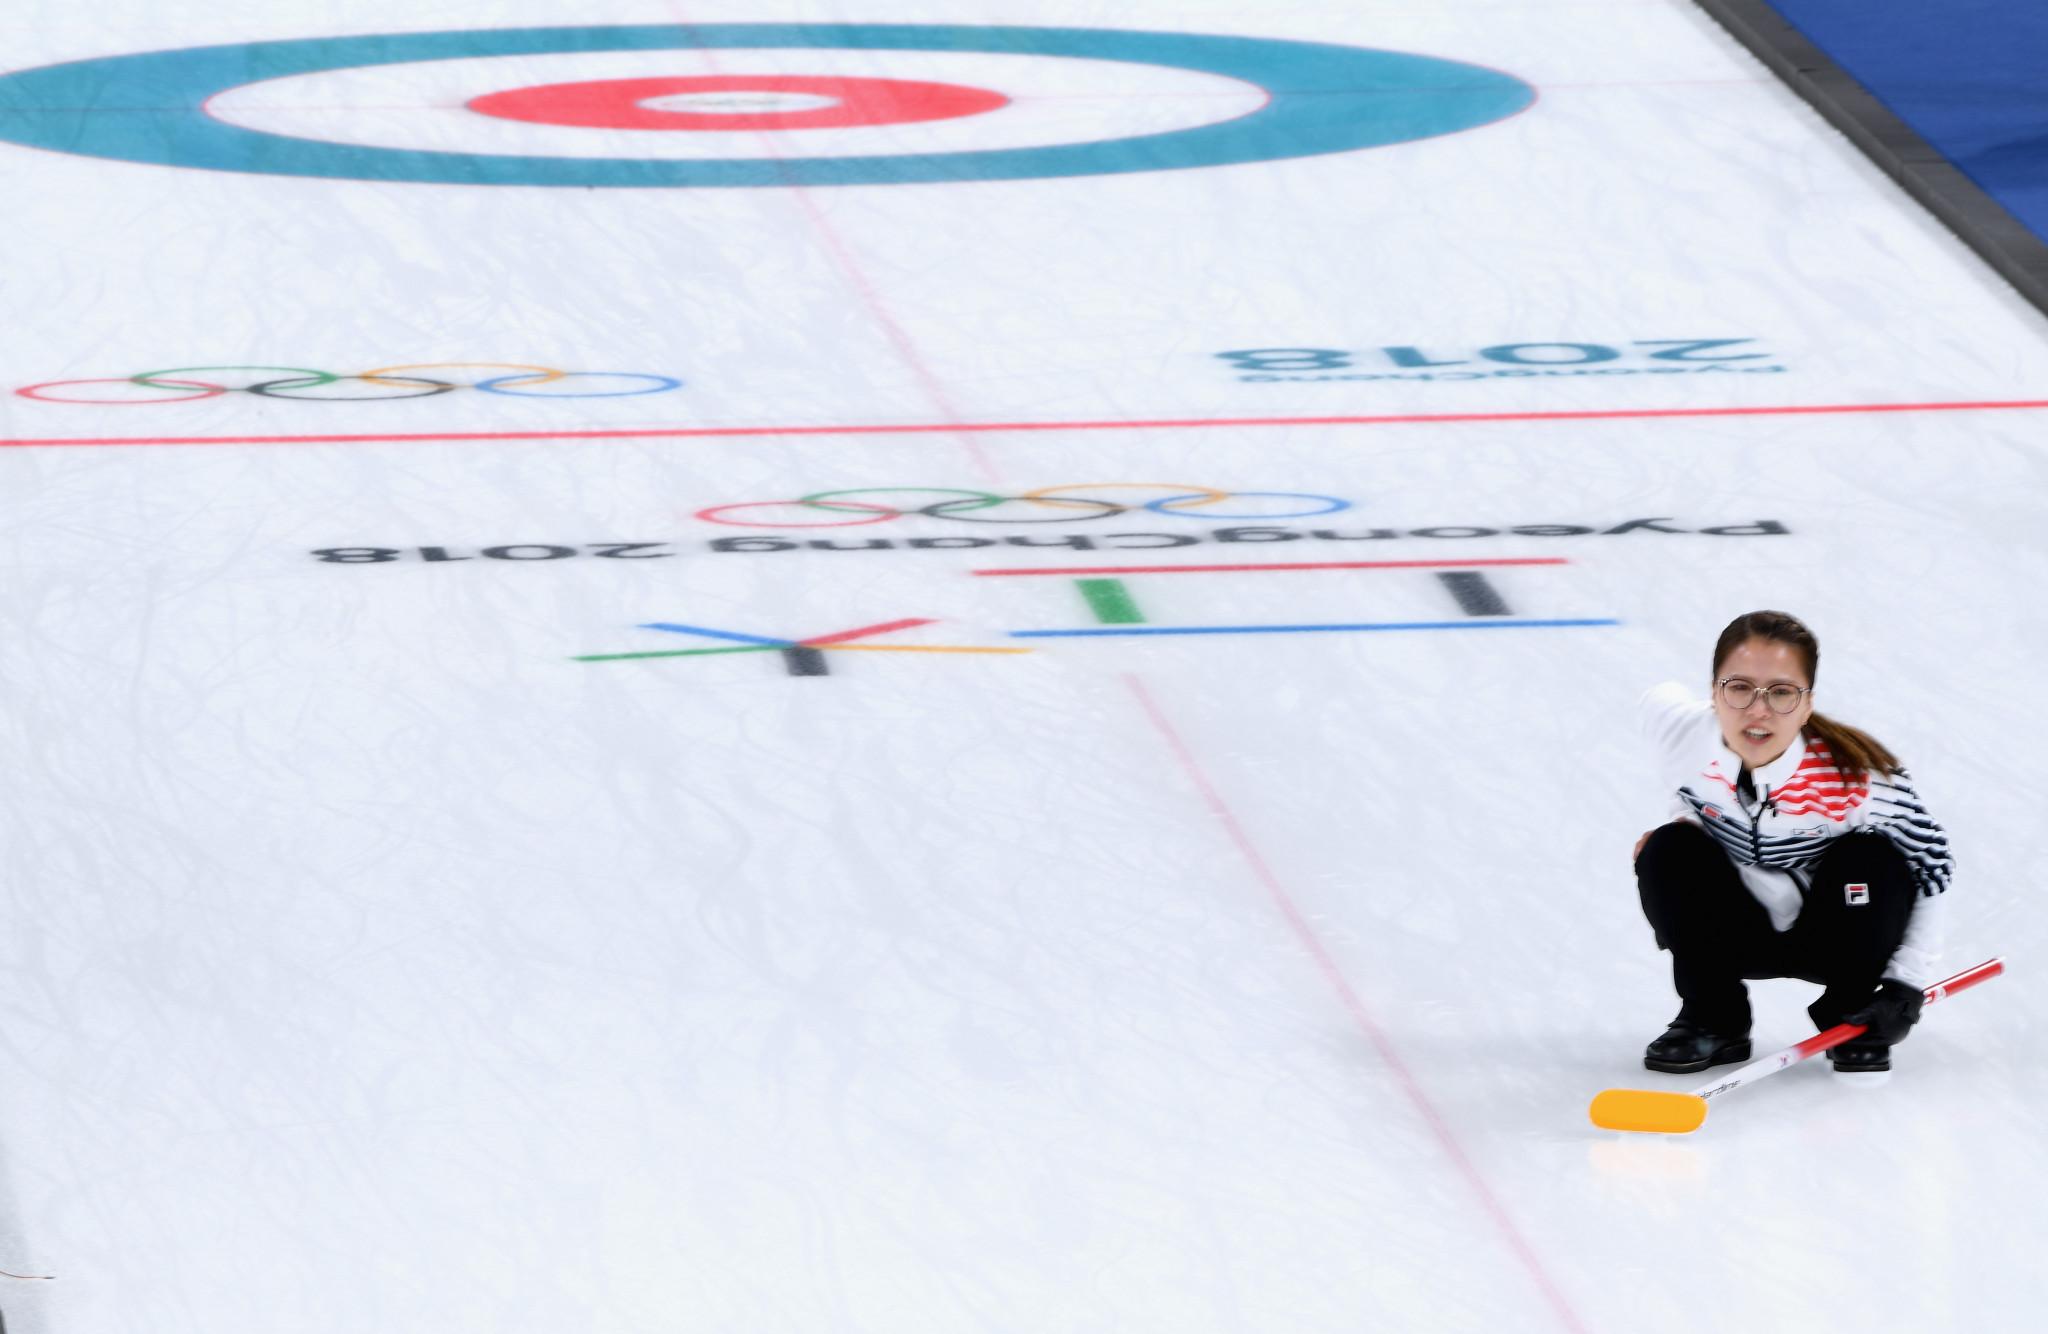 KCF names South Korea curling coaches before Beijing 2022 following abuse scandal